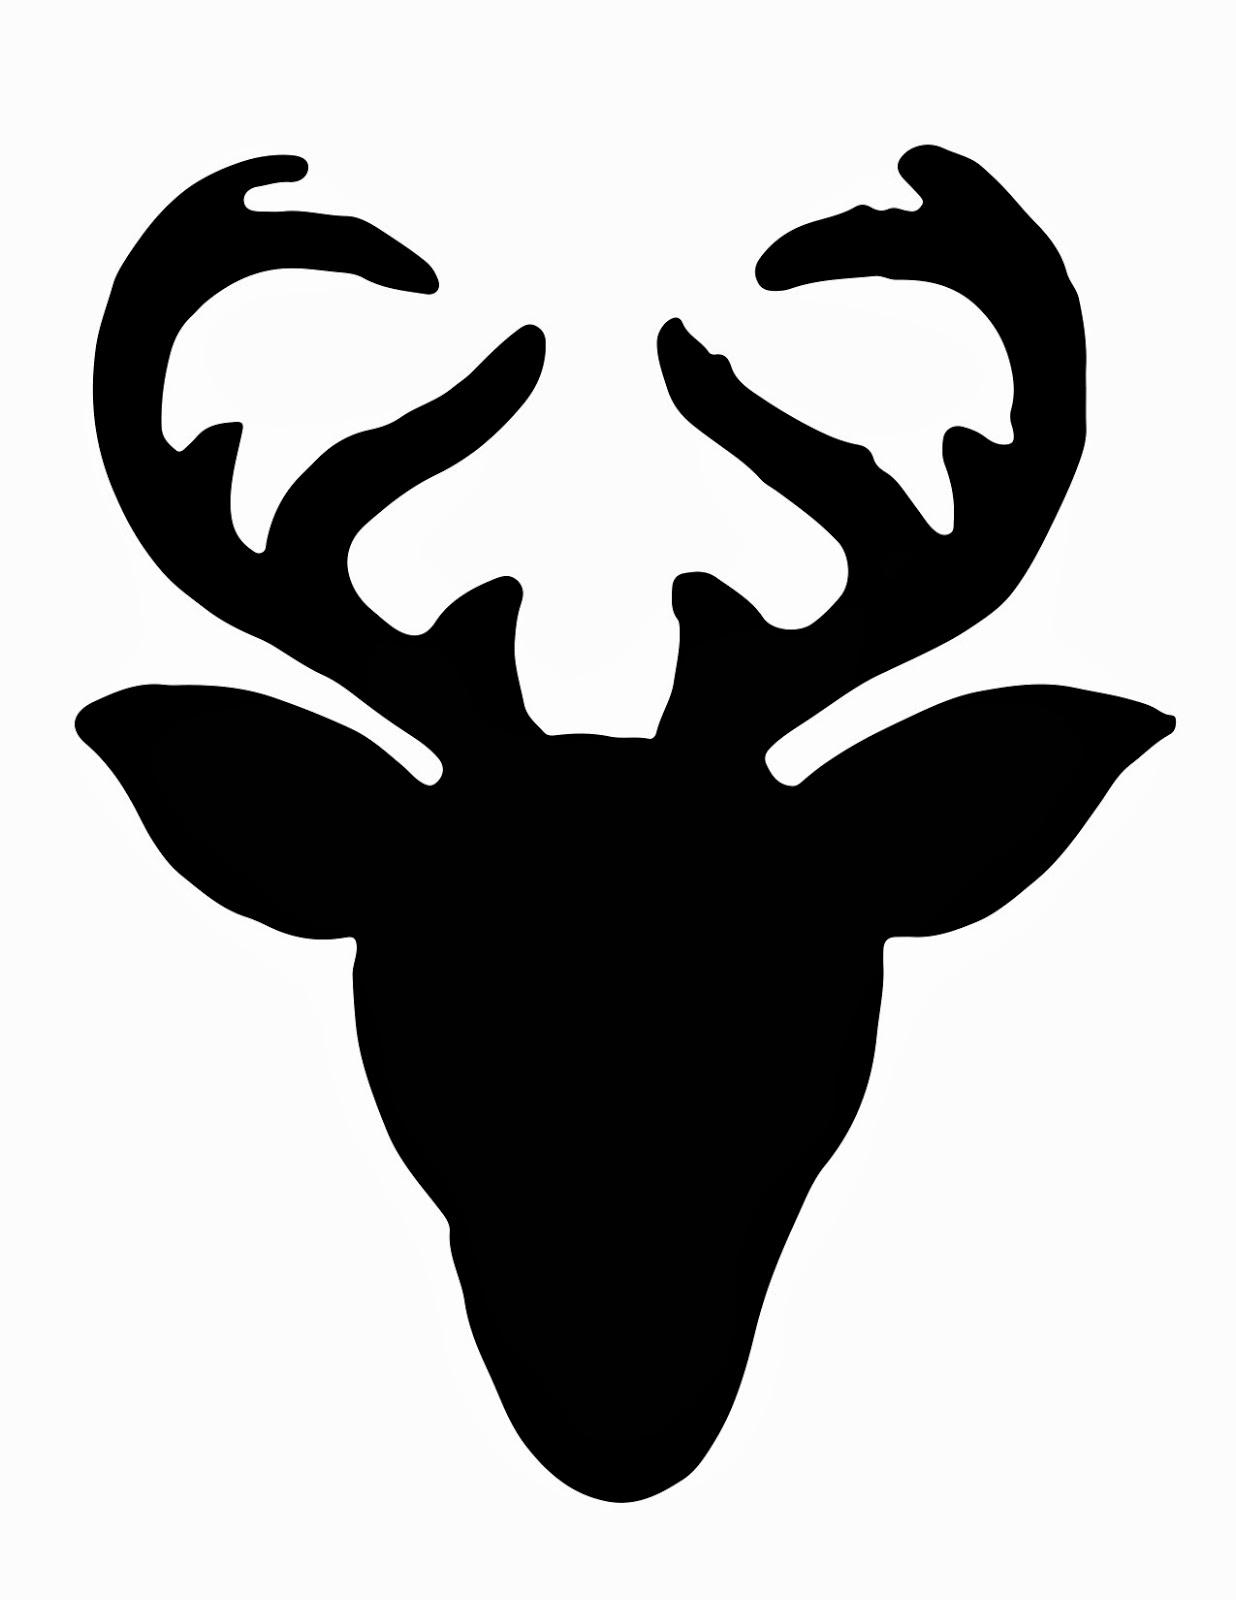 Deer Head Silhouette Clip Art Free.